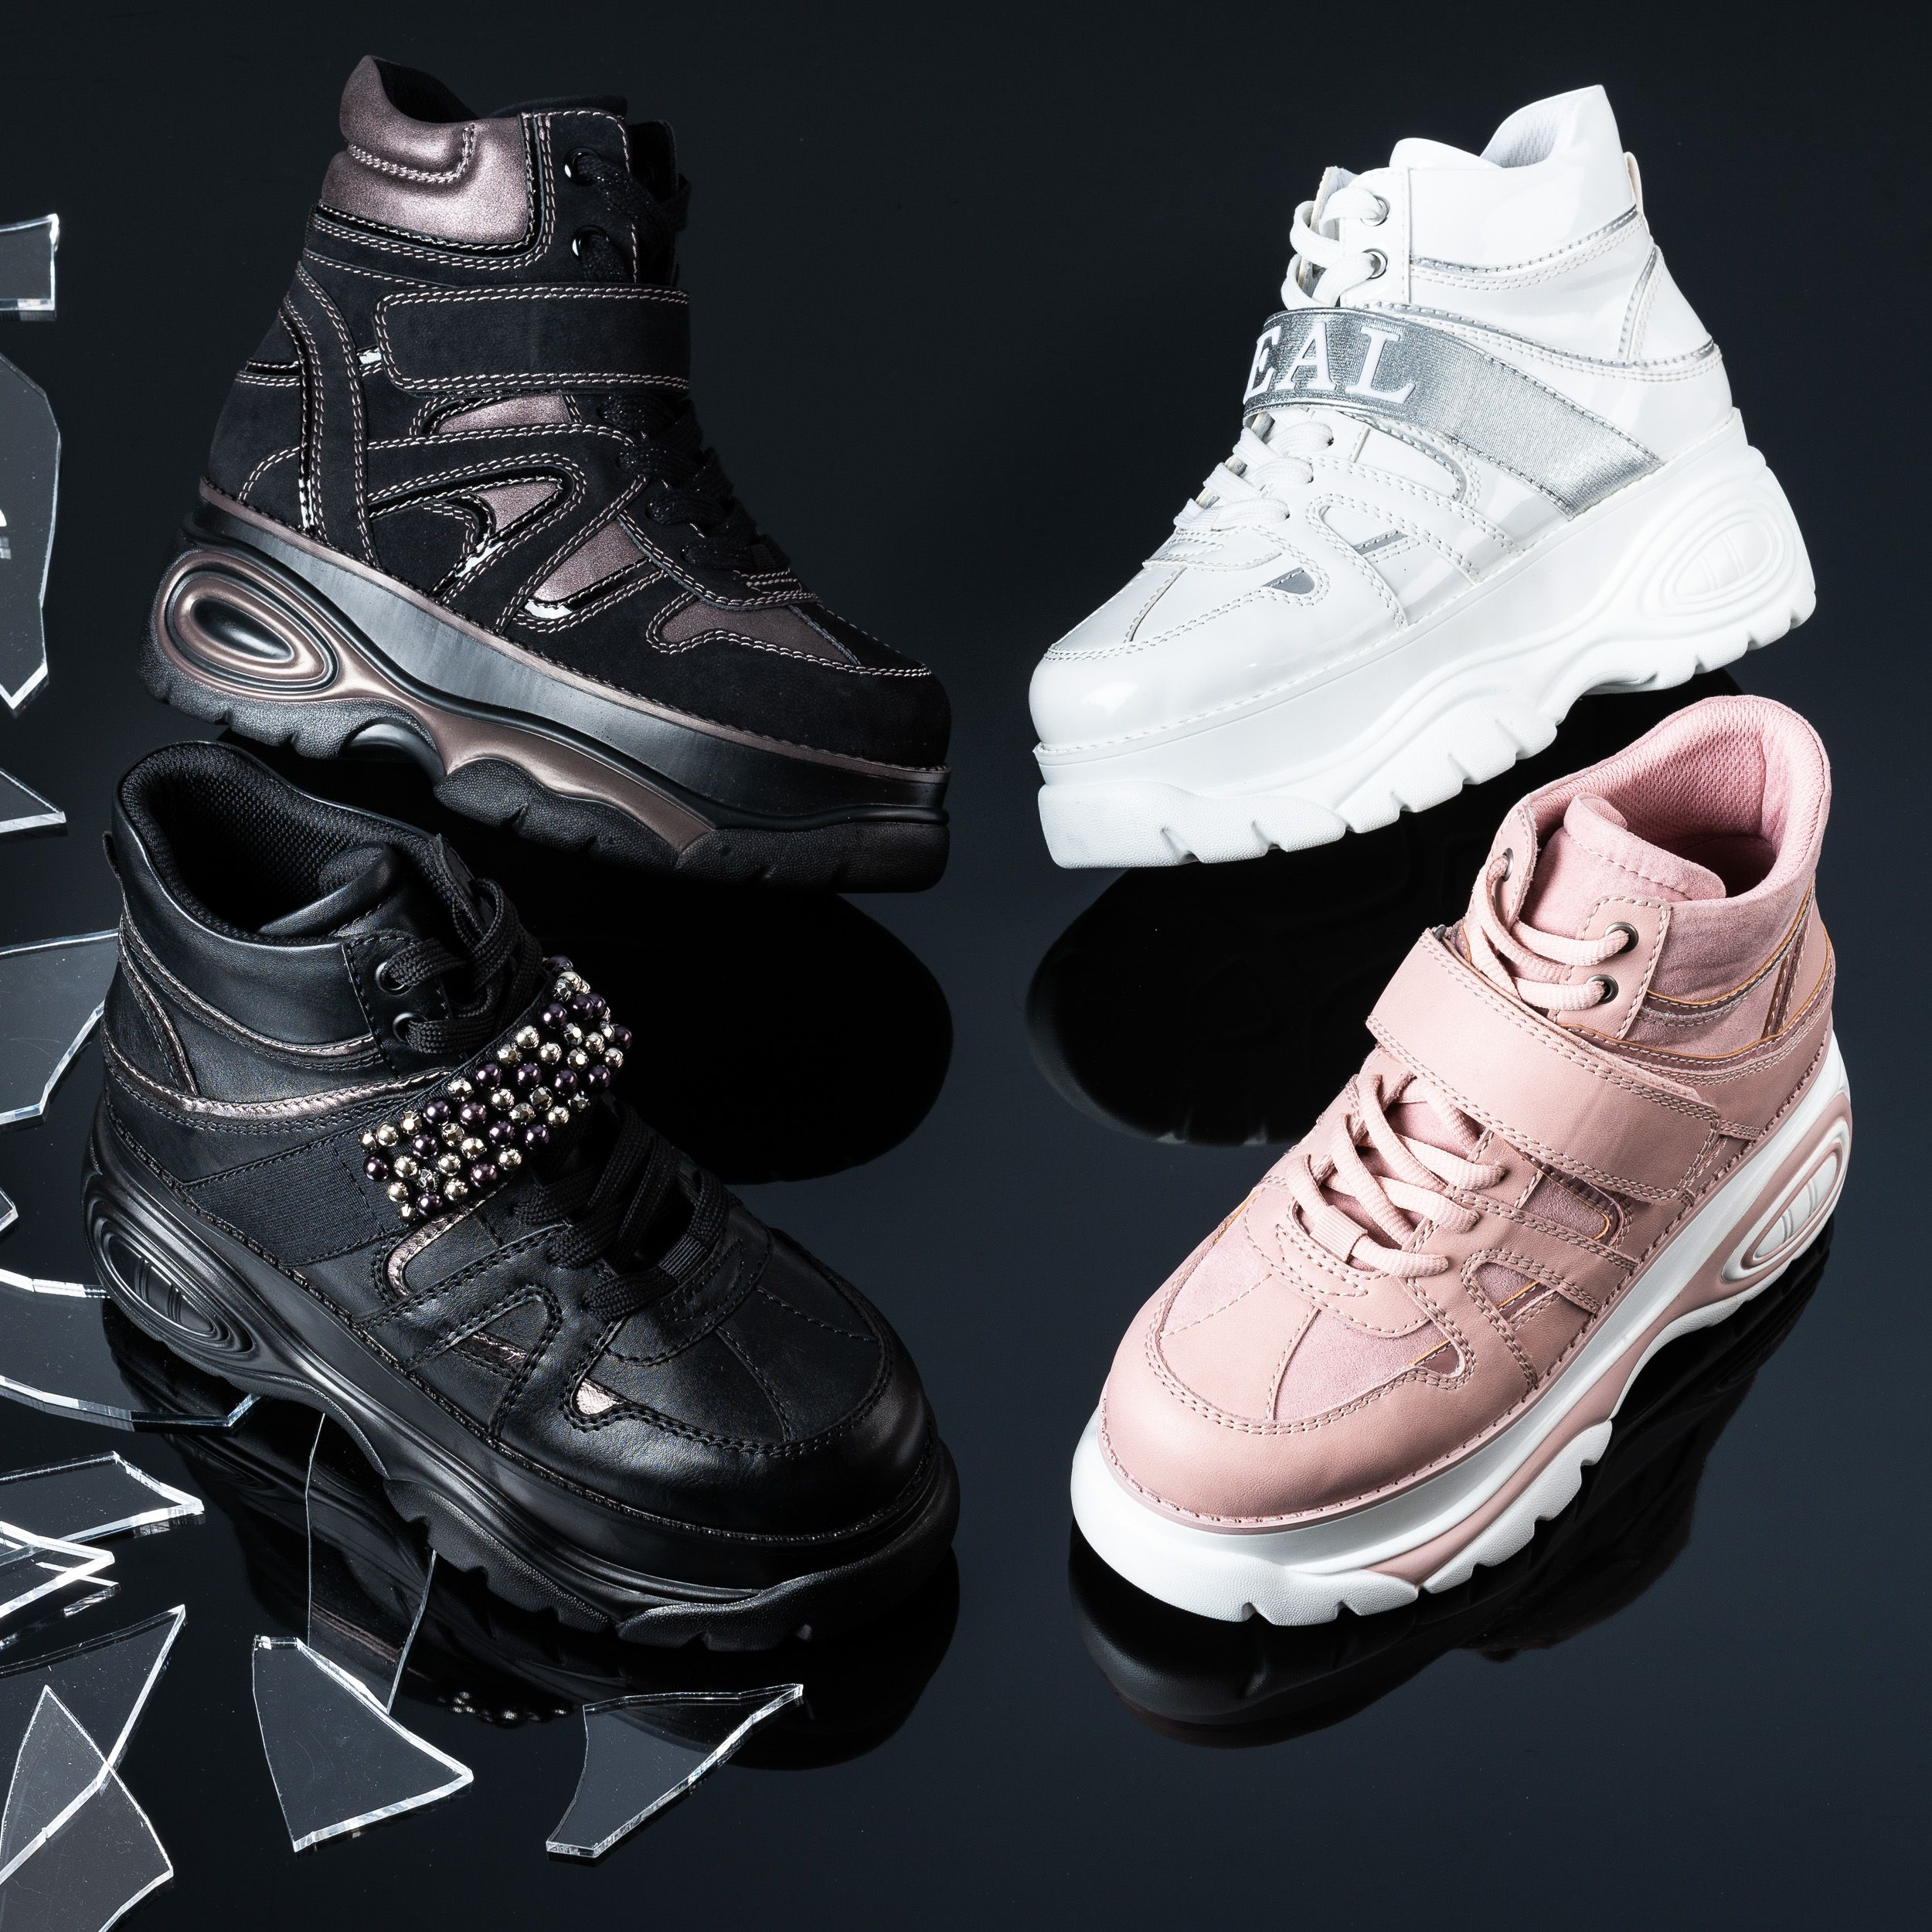 premium selection f3273 ac4f0 Style Explosion by Deichmann | Shoes в 2019 г.